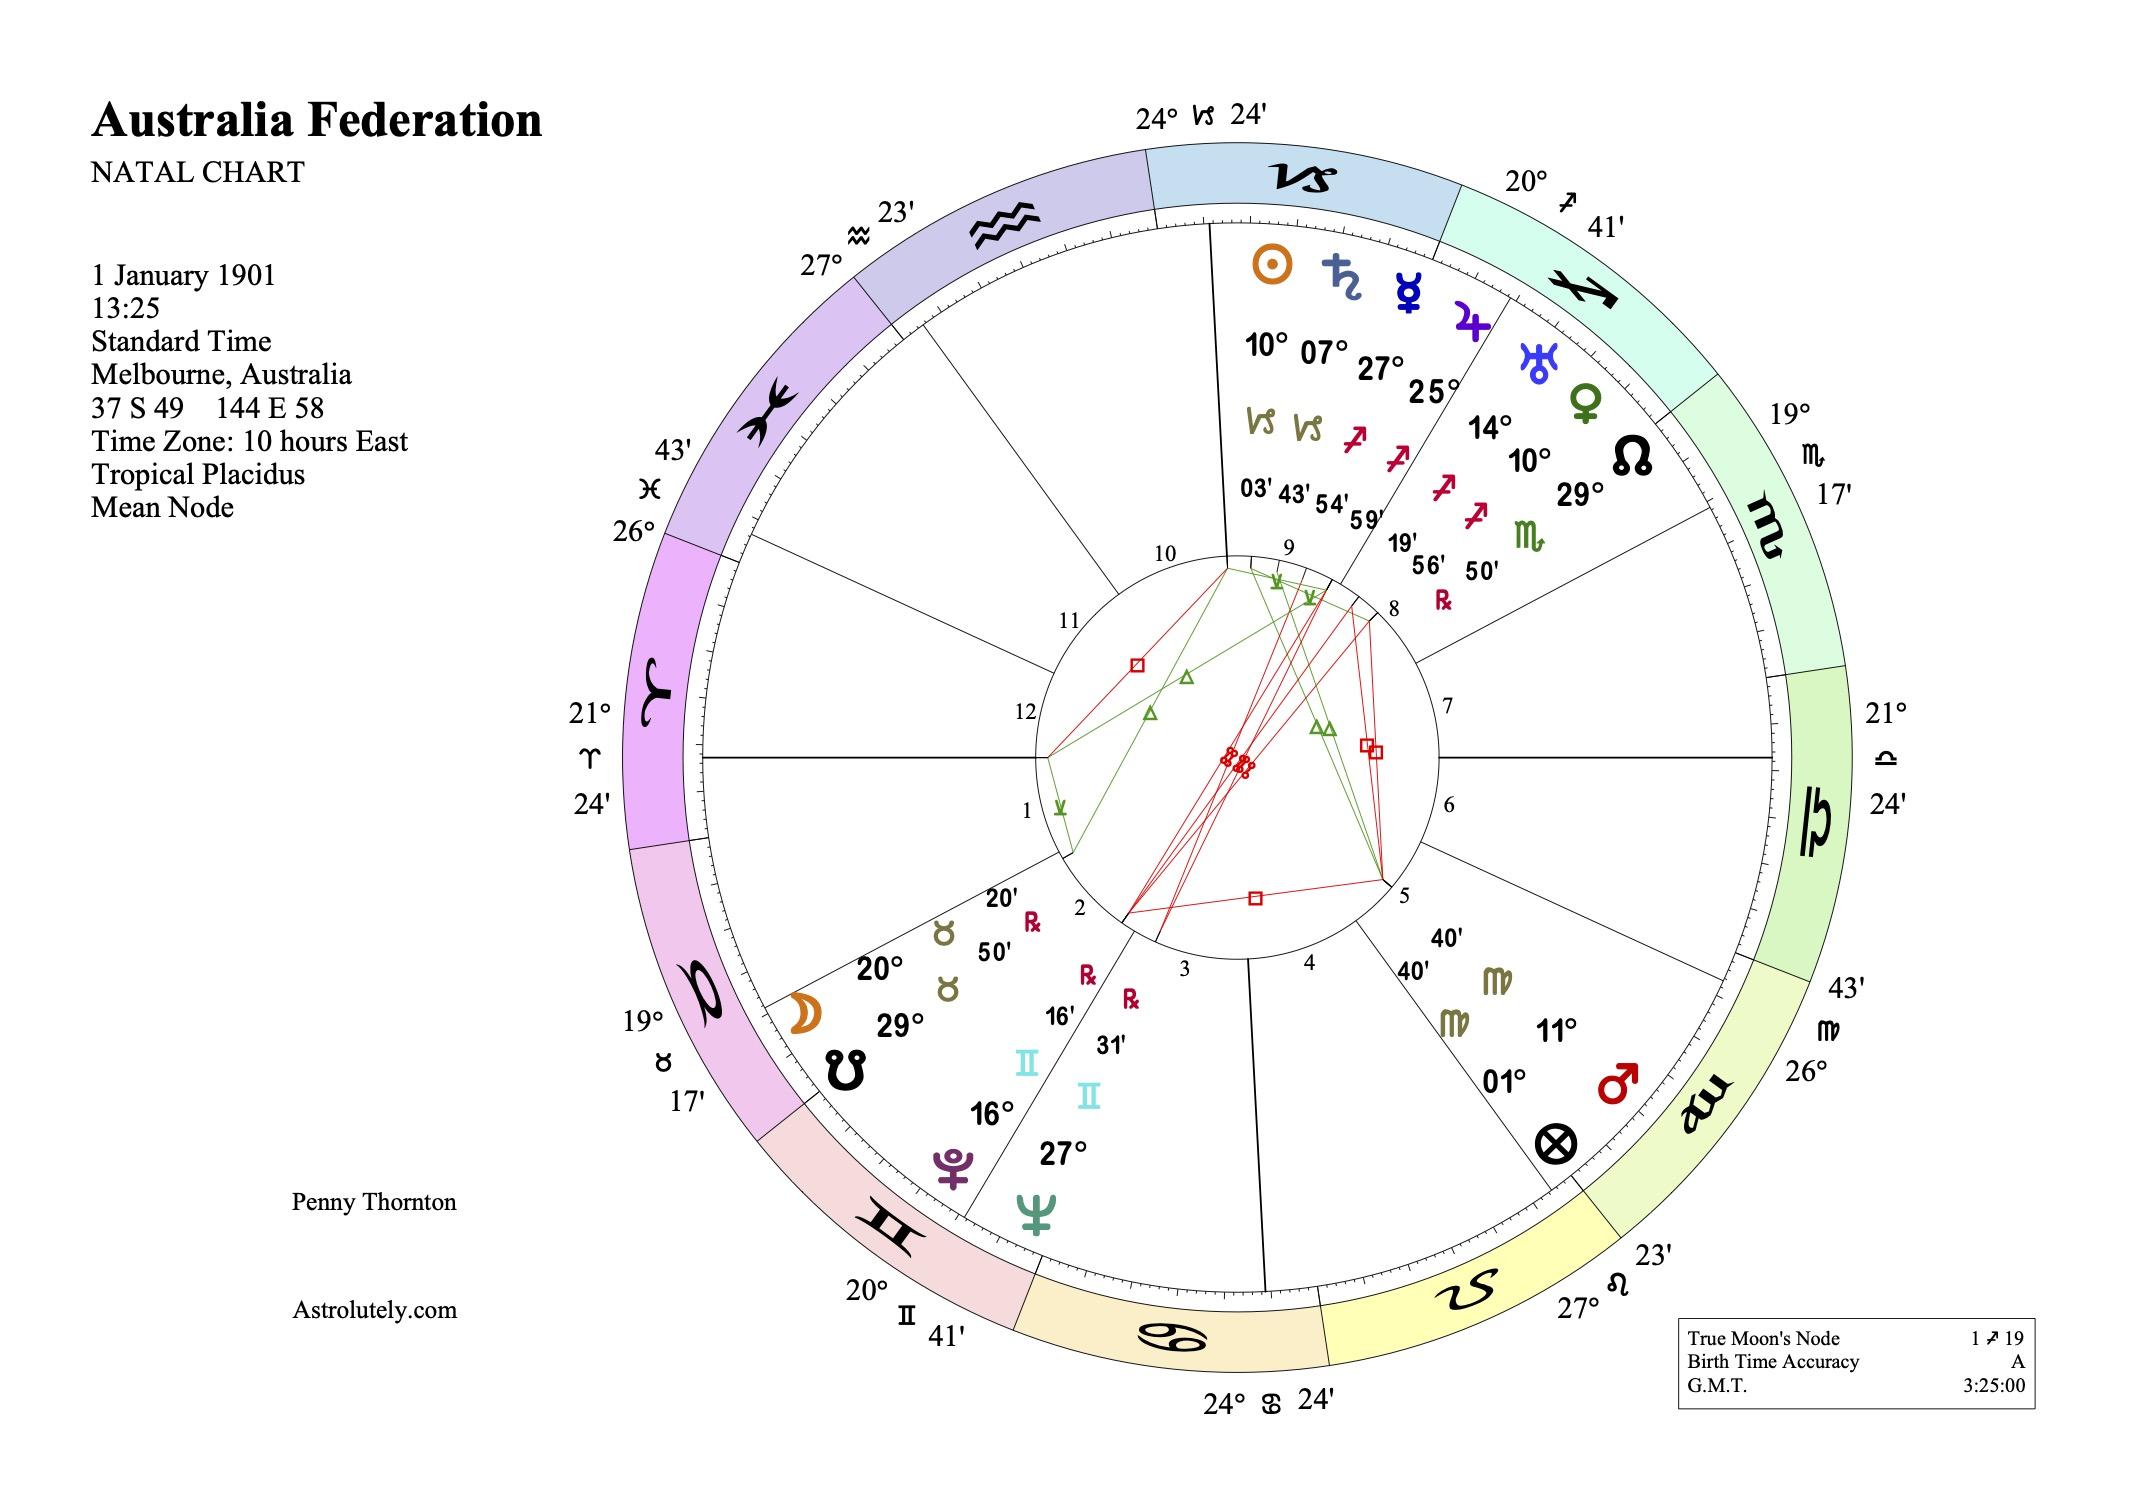 Australian Federation Chart